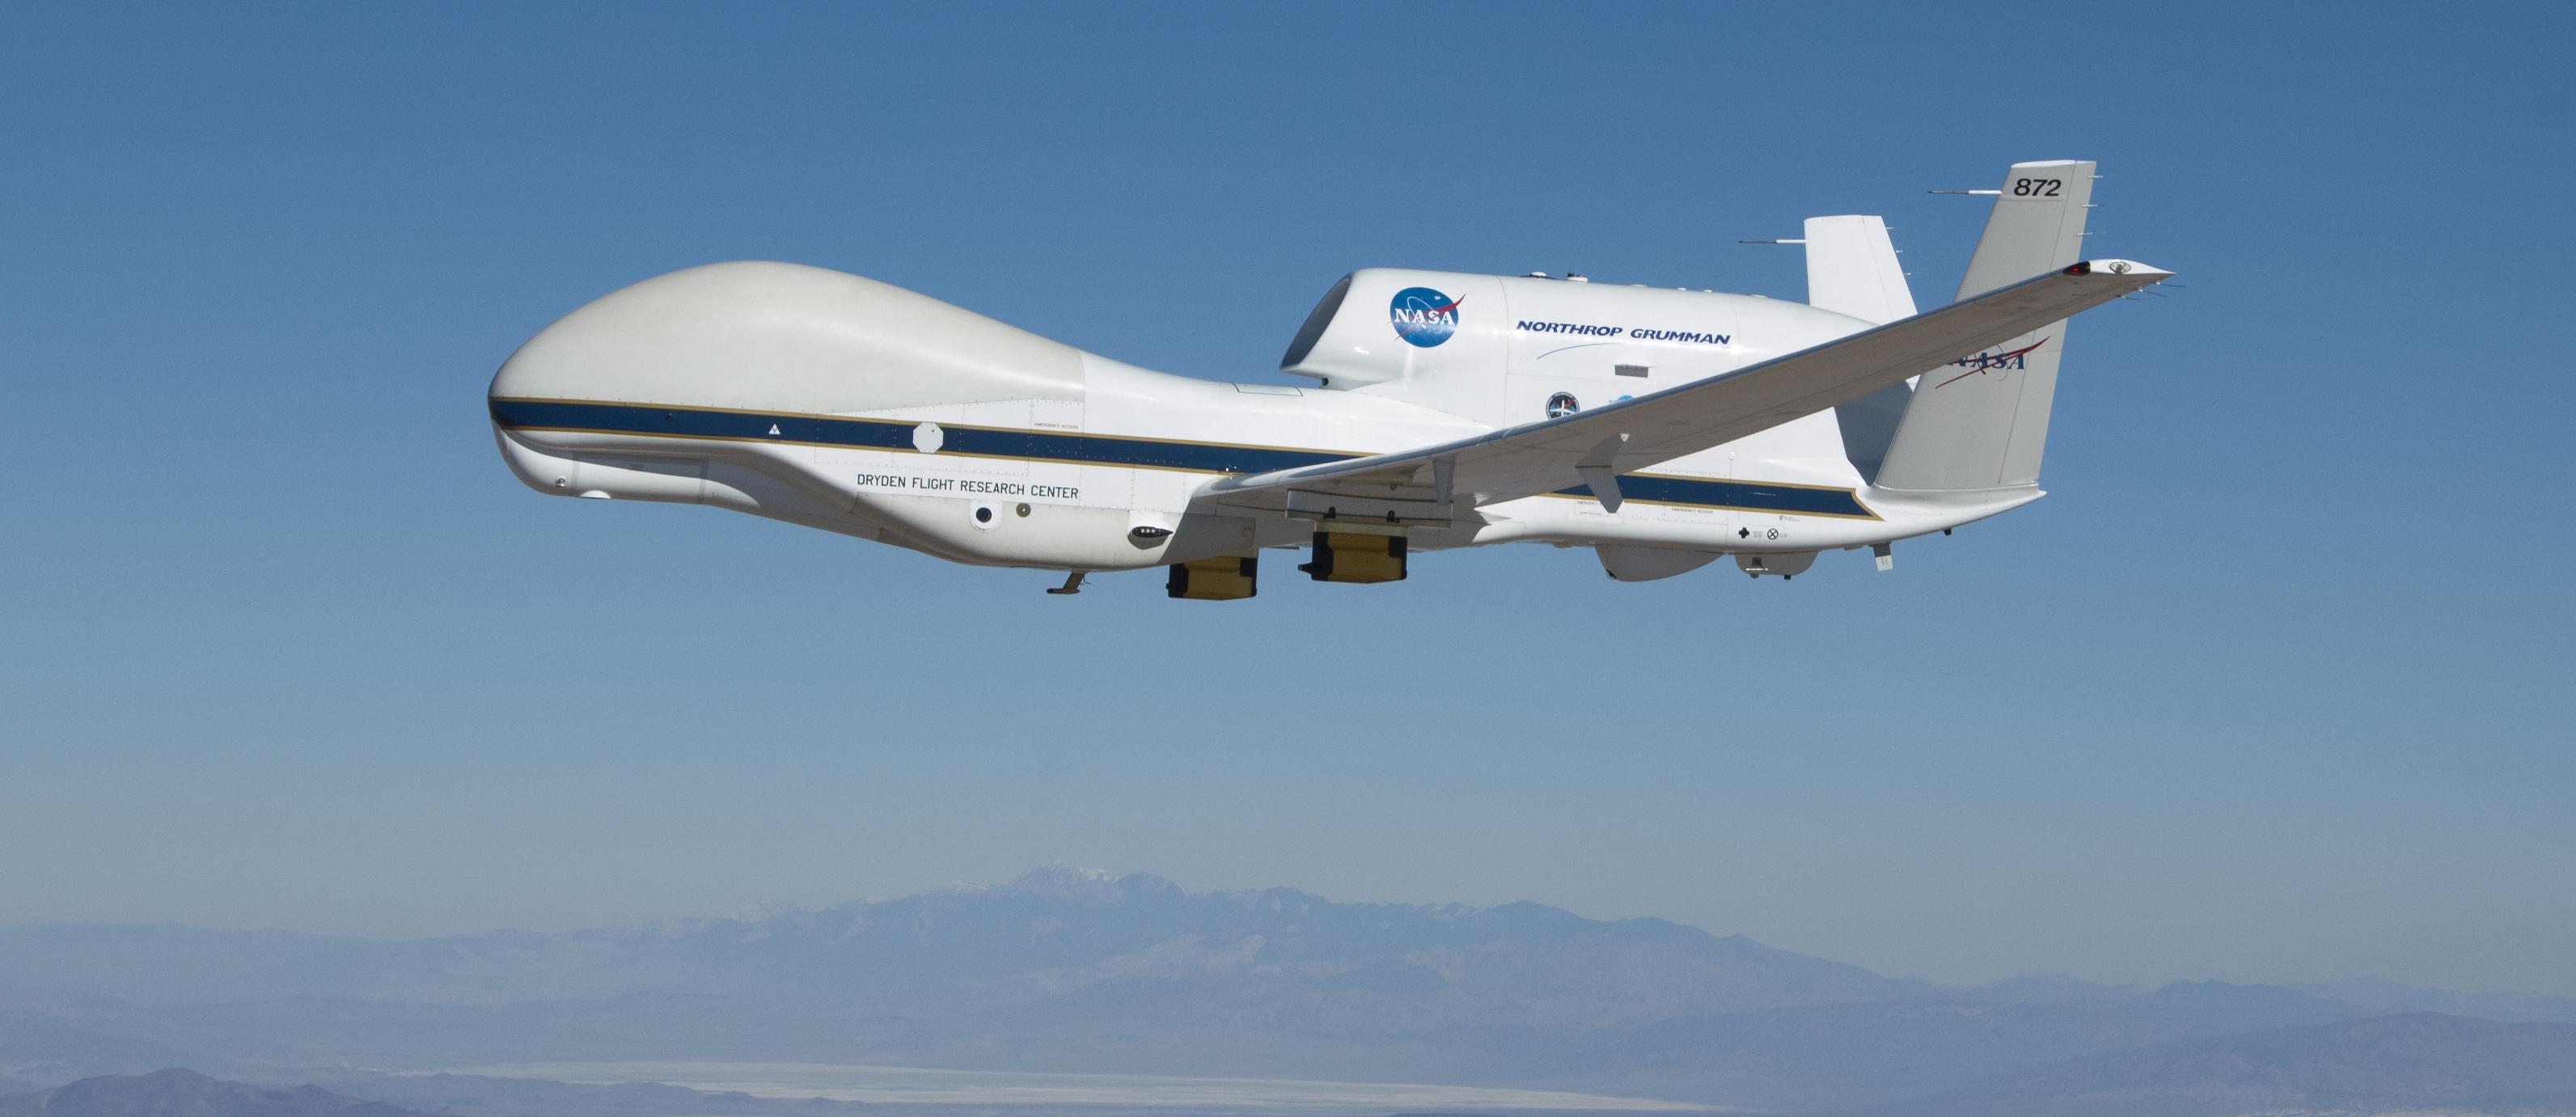 NASA Global Hawk 872 carries the Hawkeye sensors on wing-mounted    Nasa Global Hawk